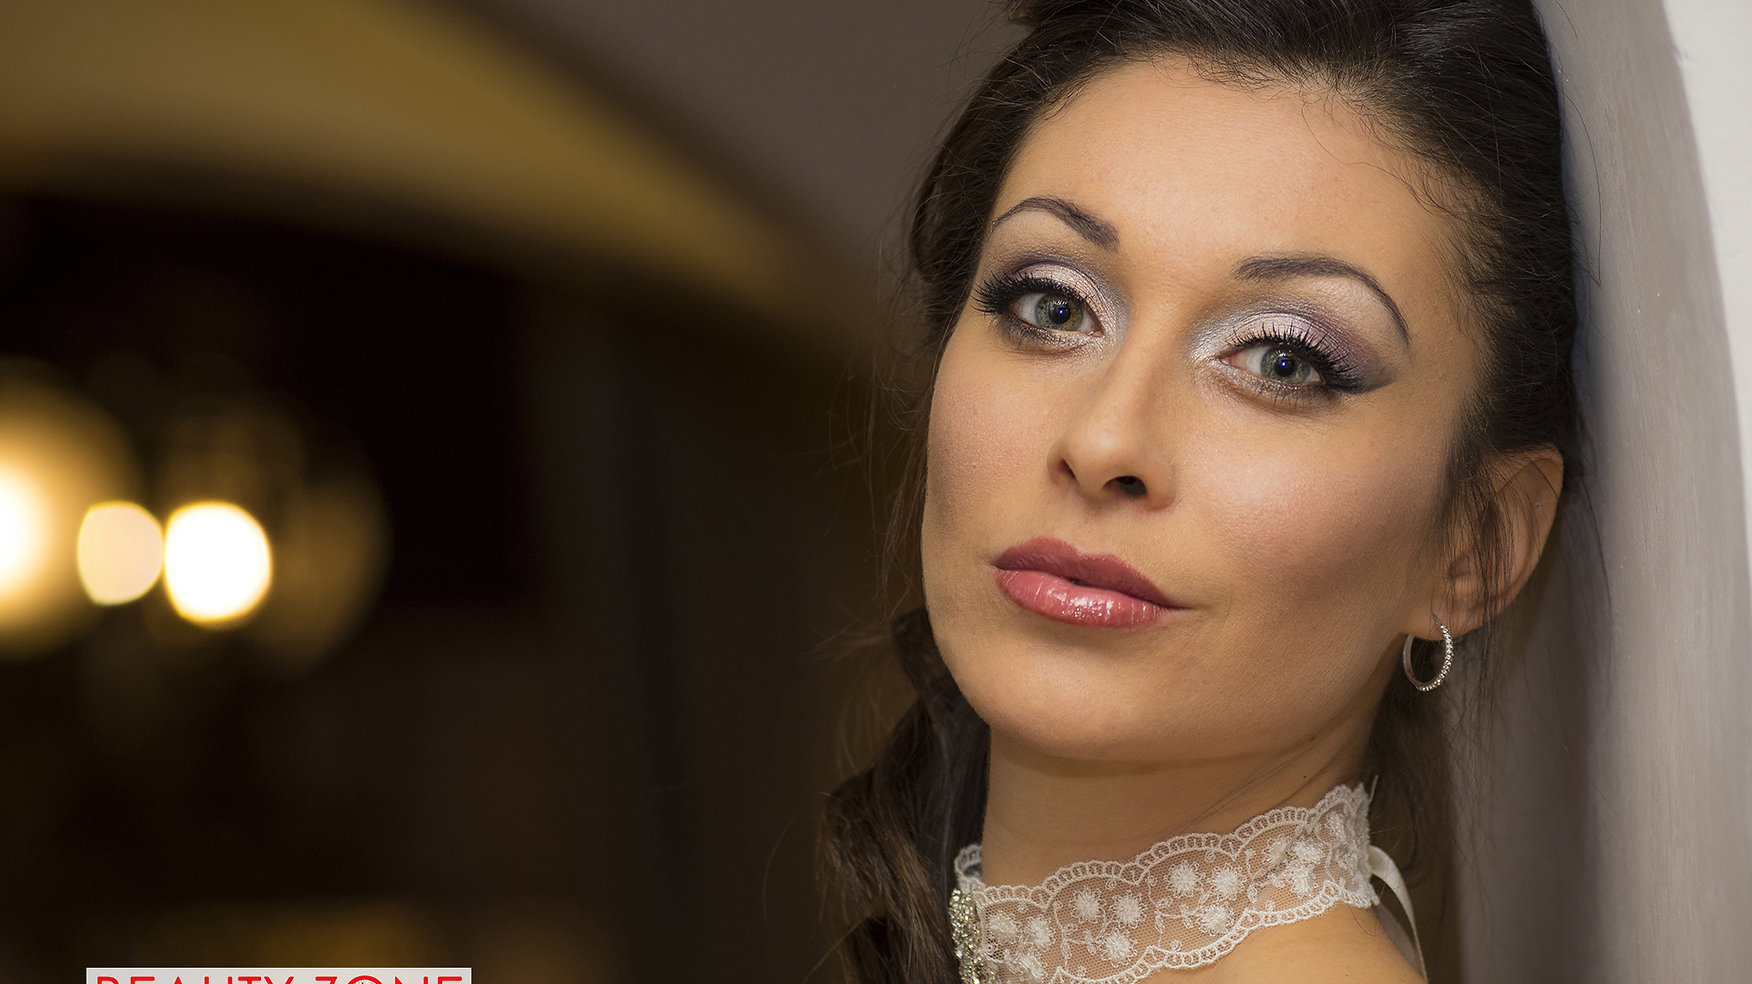 Wedding Day - Beauty Zone Make Up Specialist